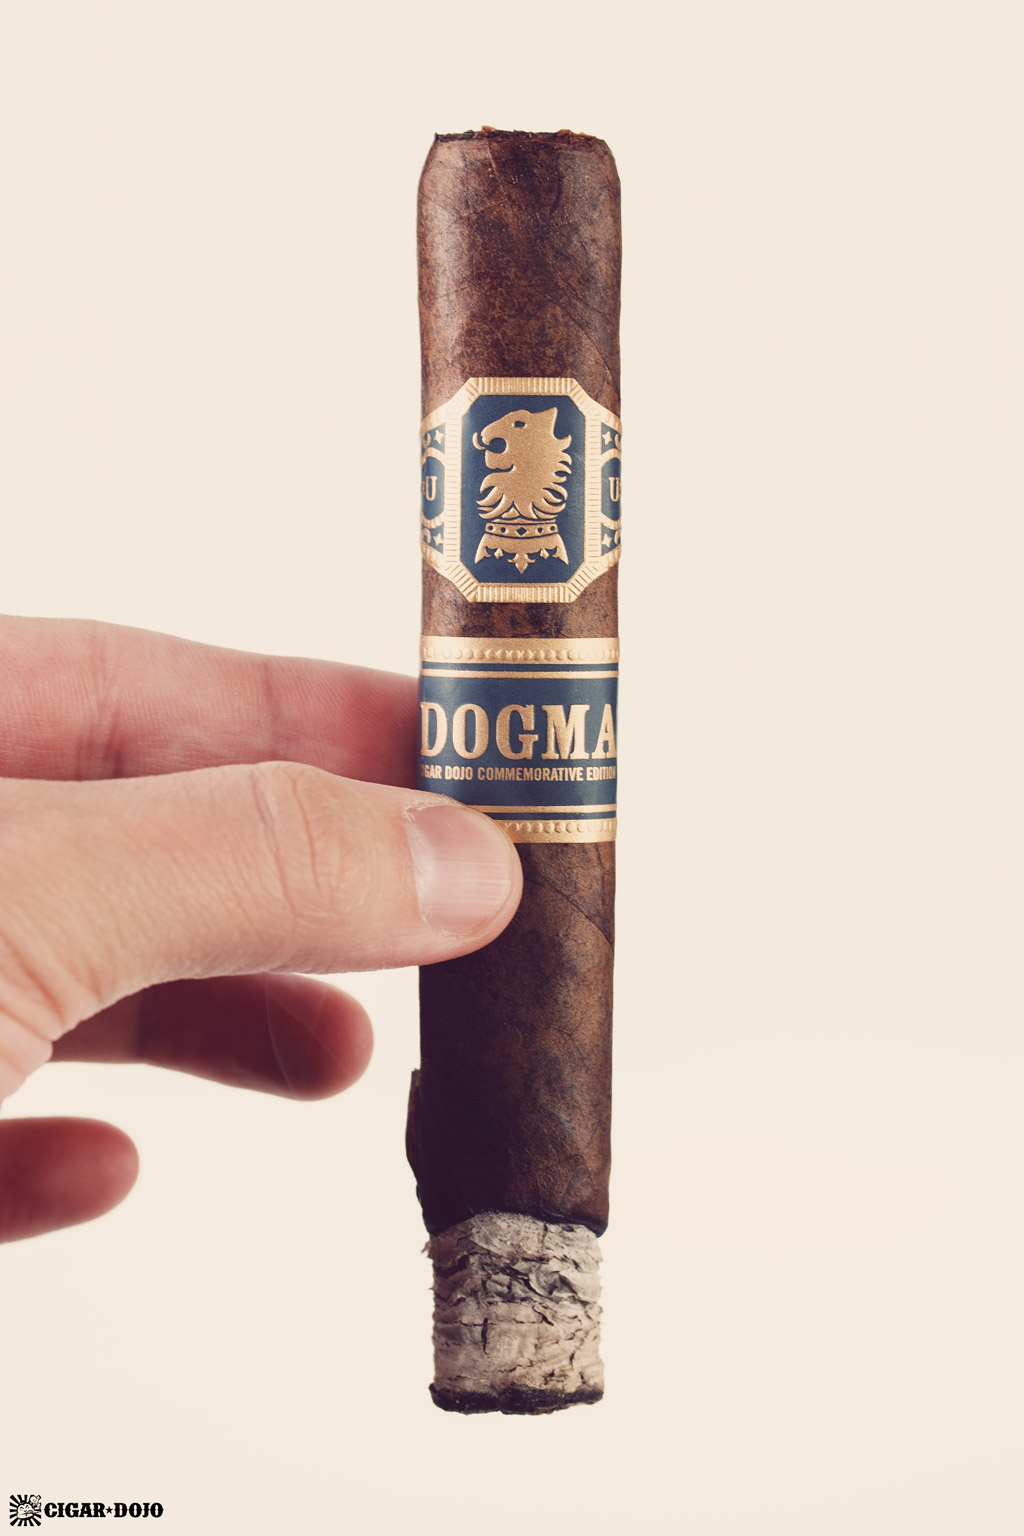 Drew Estate Undercrown Dojo Dogma Maduro 2020 cigar smoking upright